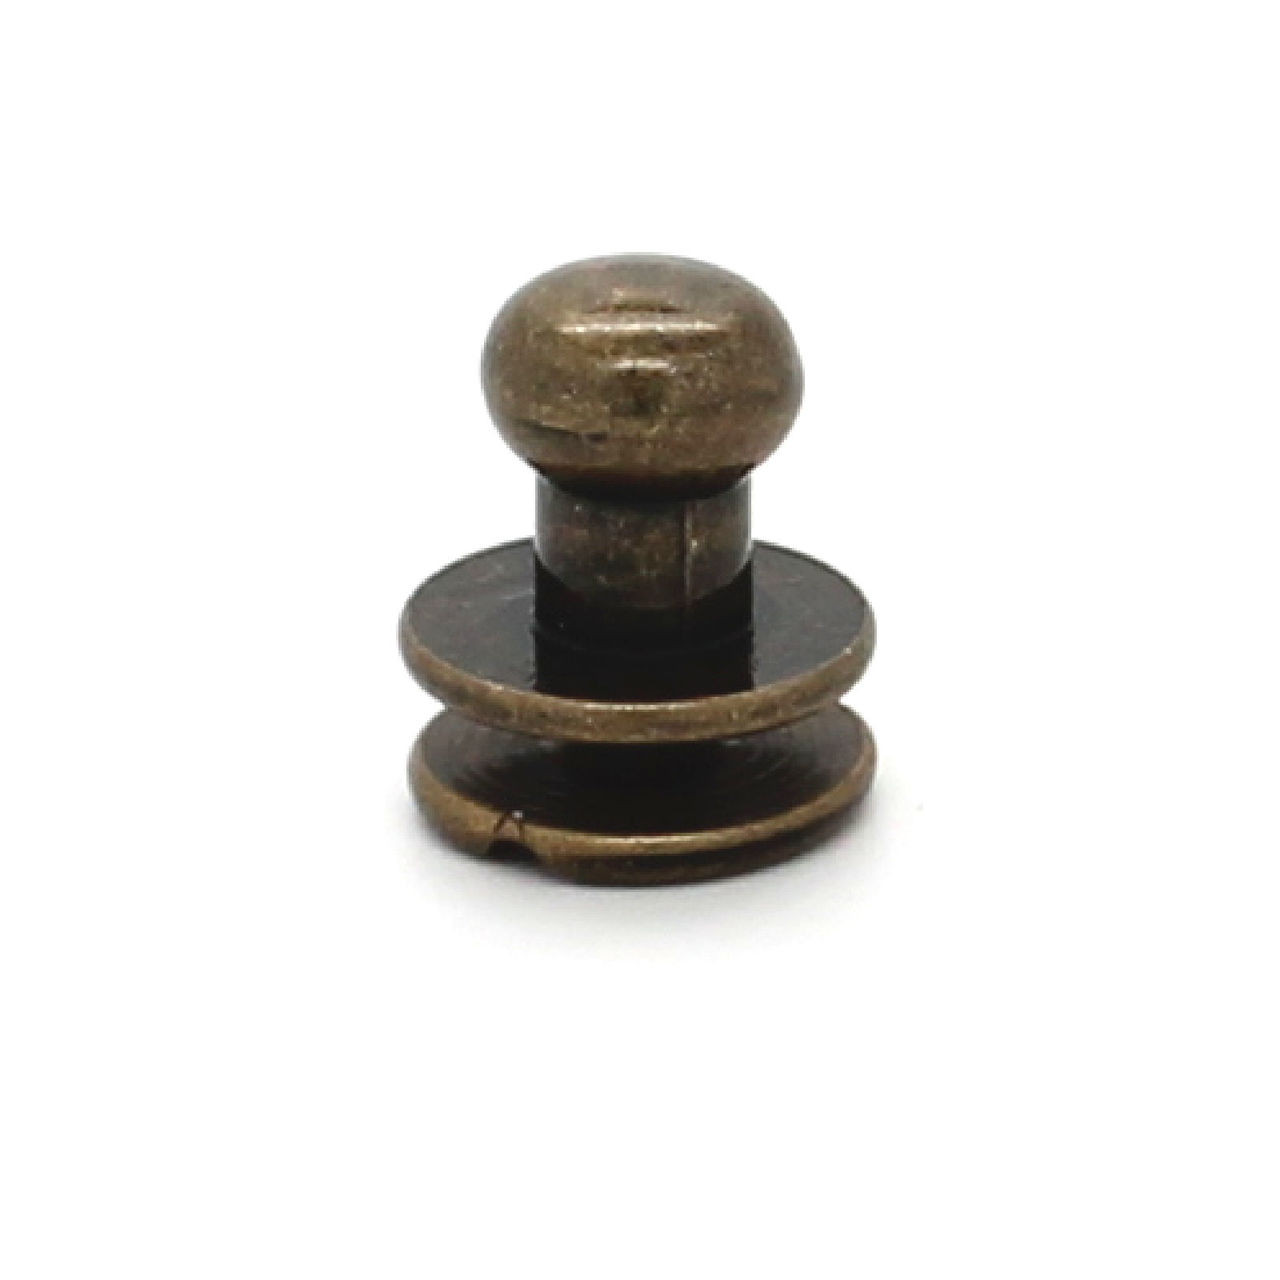 Button Stud Antique Brass 8 mm Screw Back